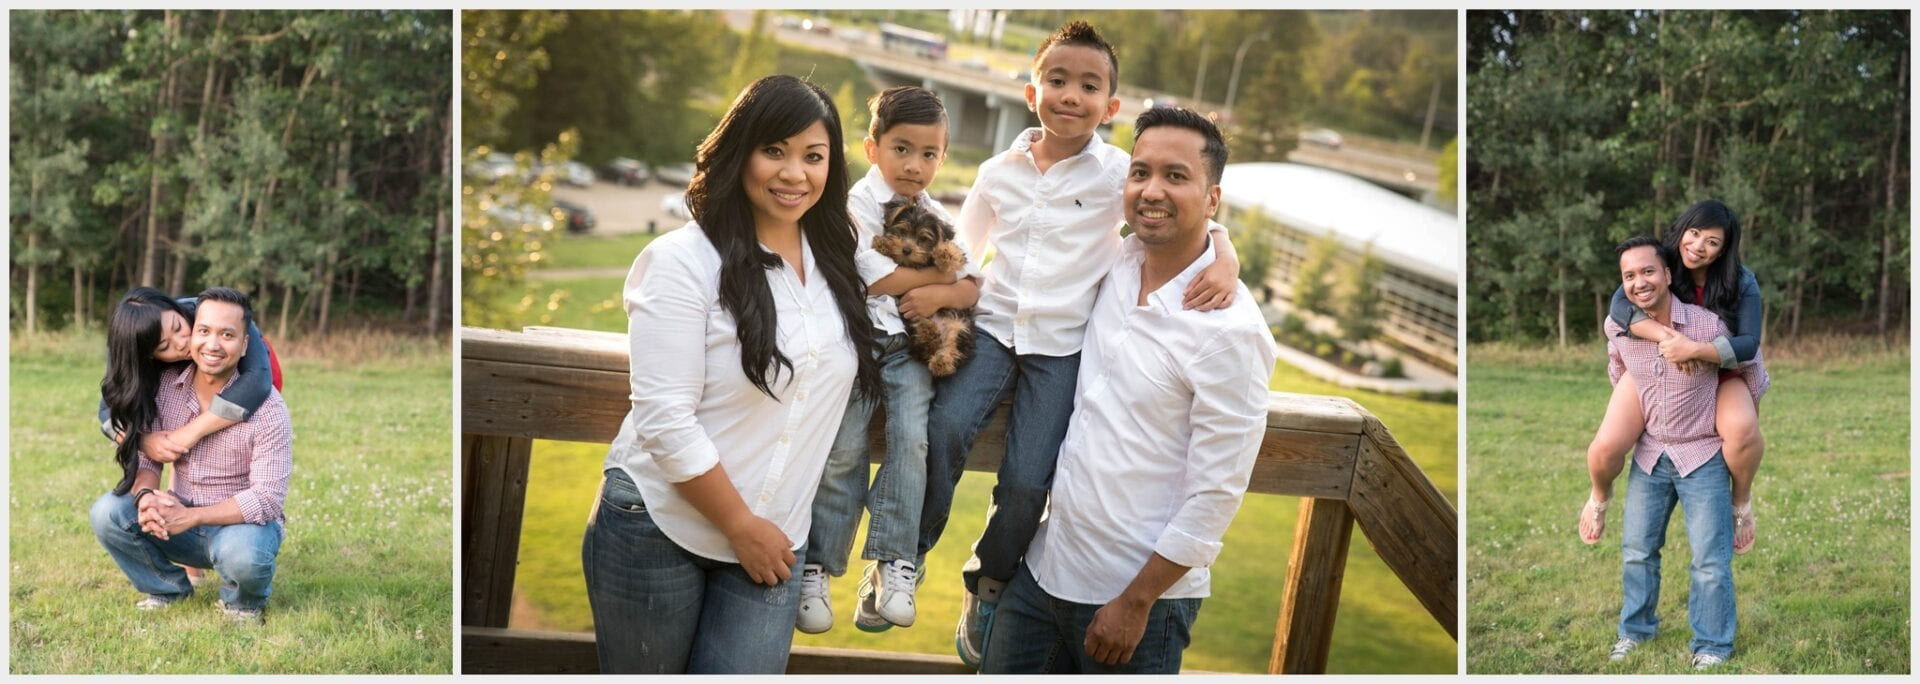 Fox Drive Whitemud Park Edmonton Family Photography Session-_0006